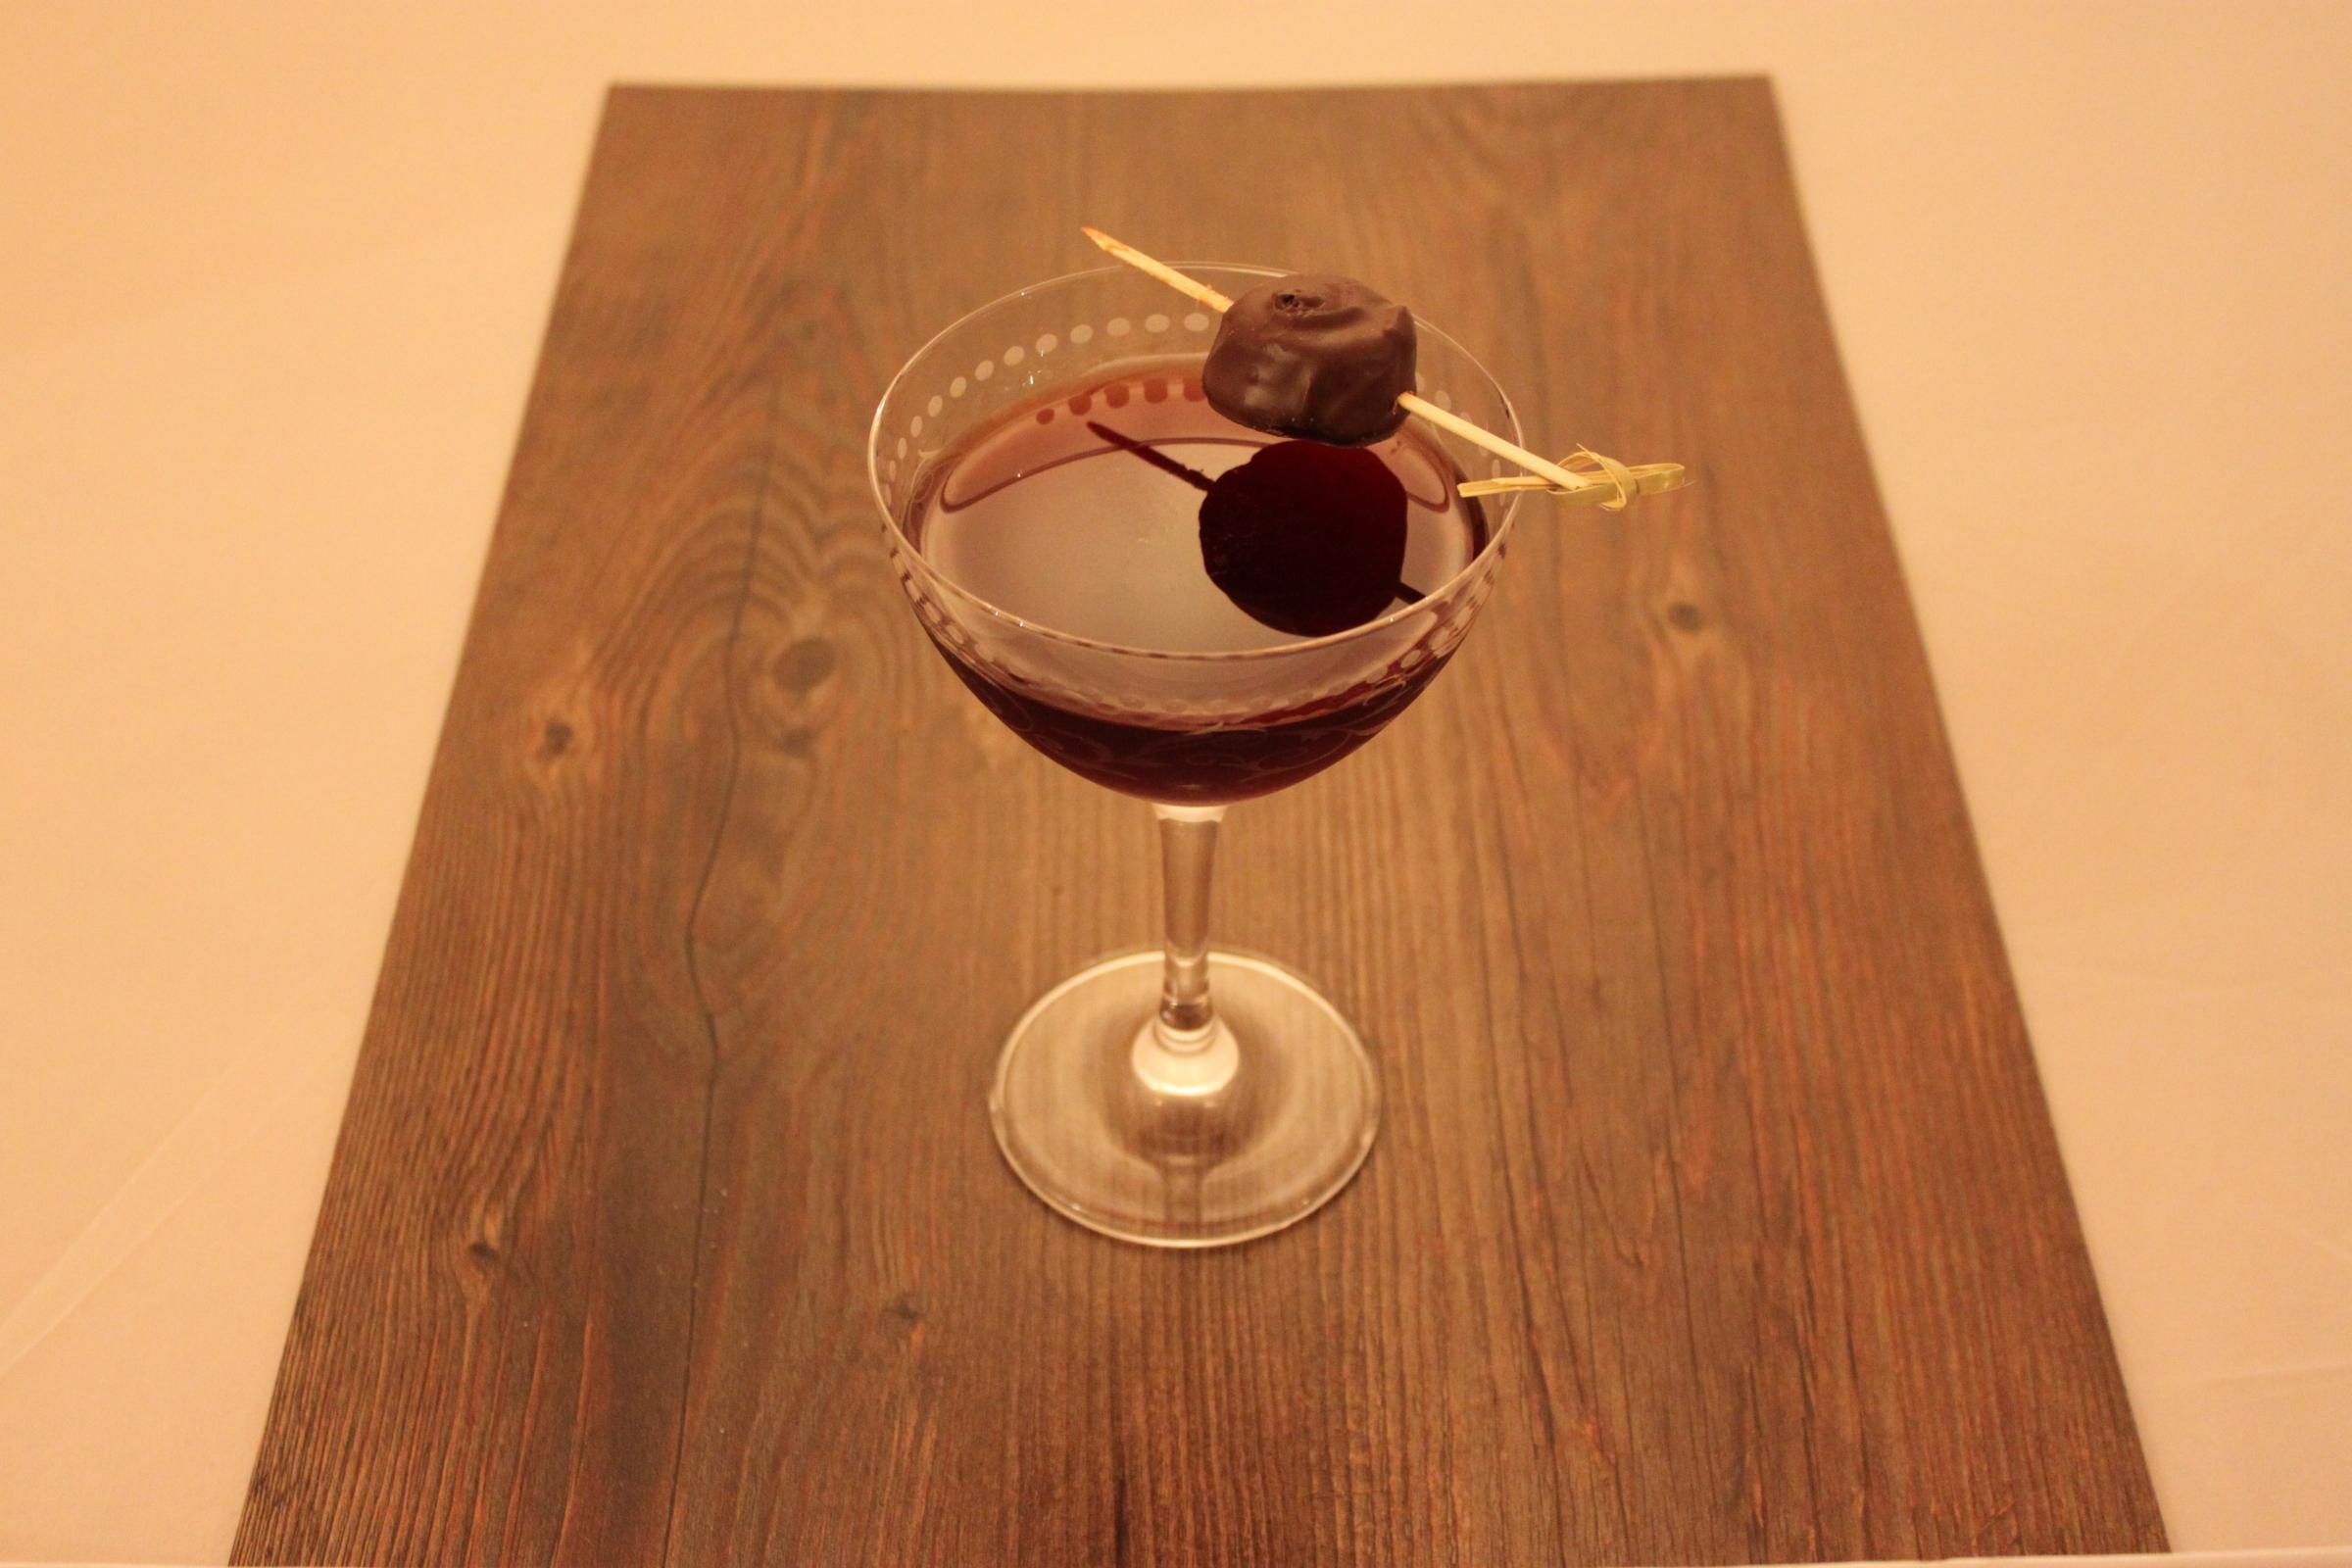 port fondue